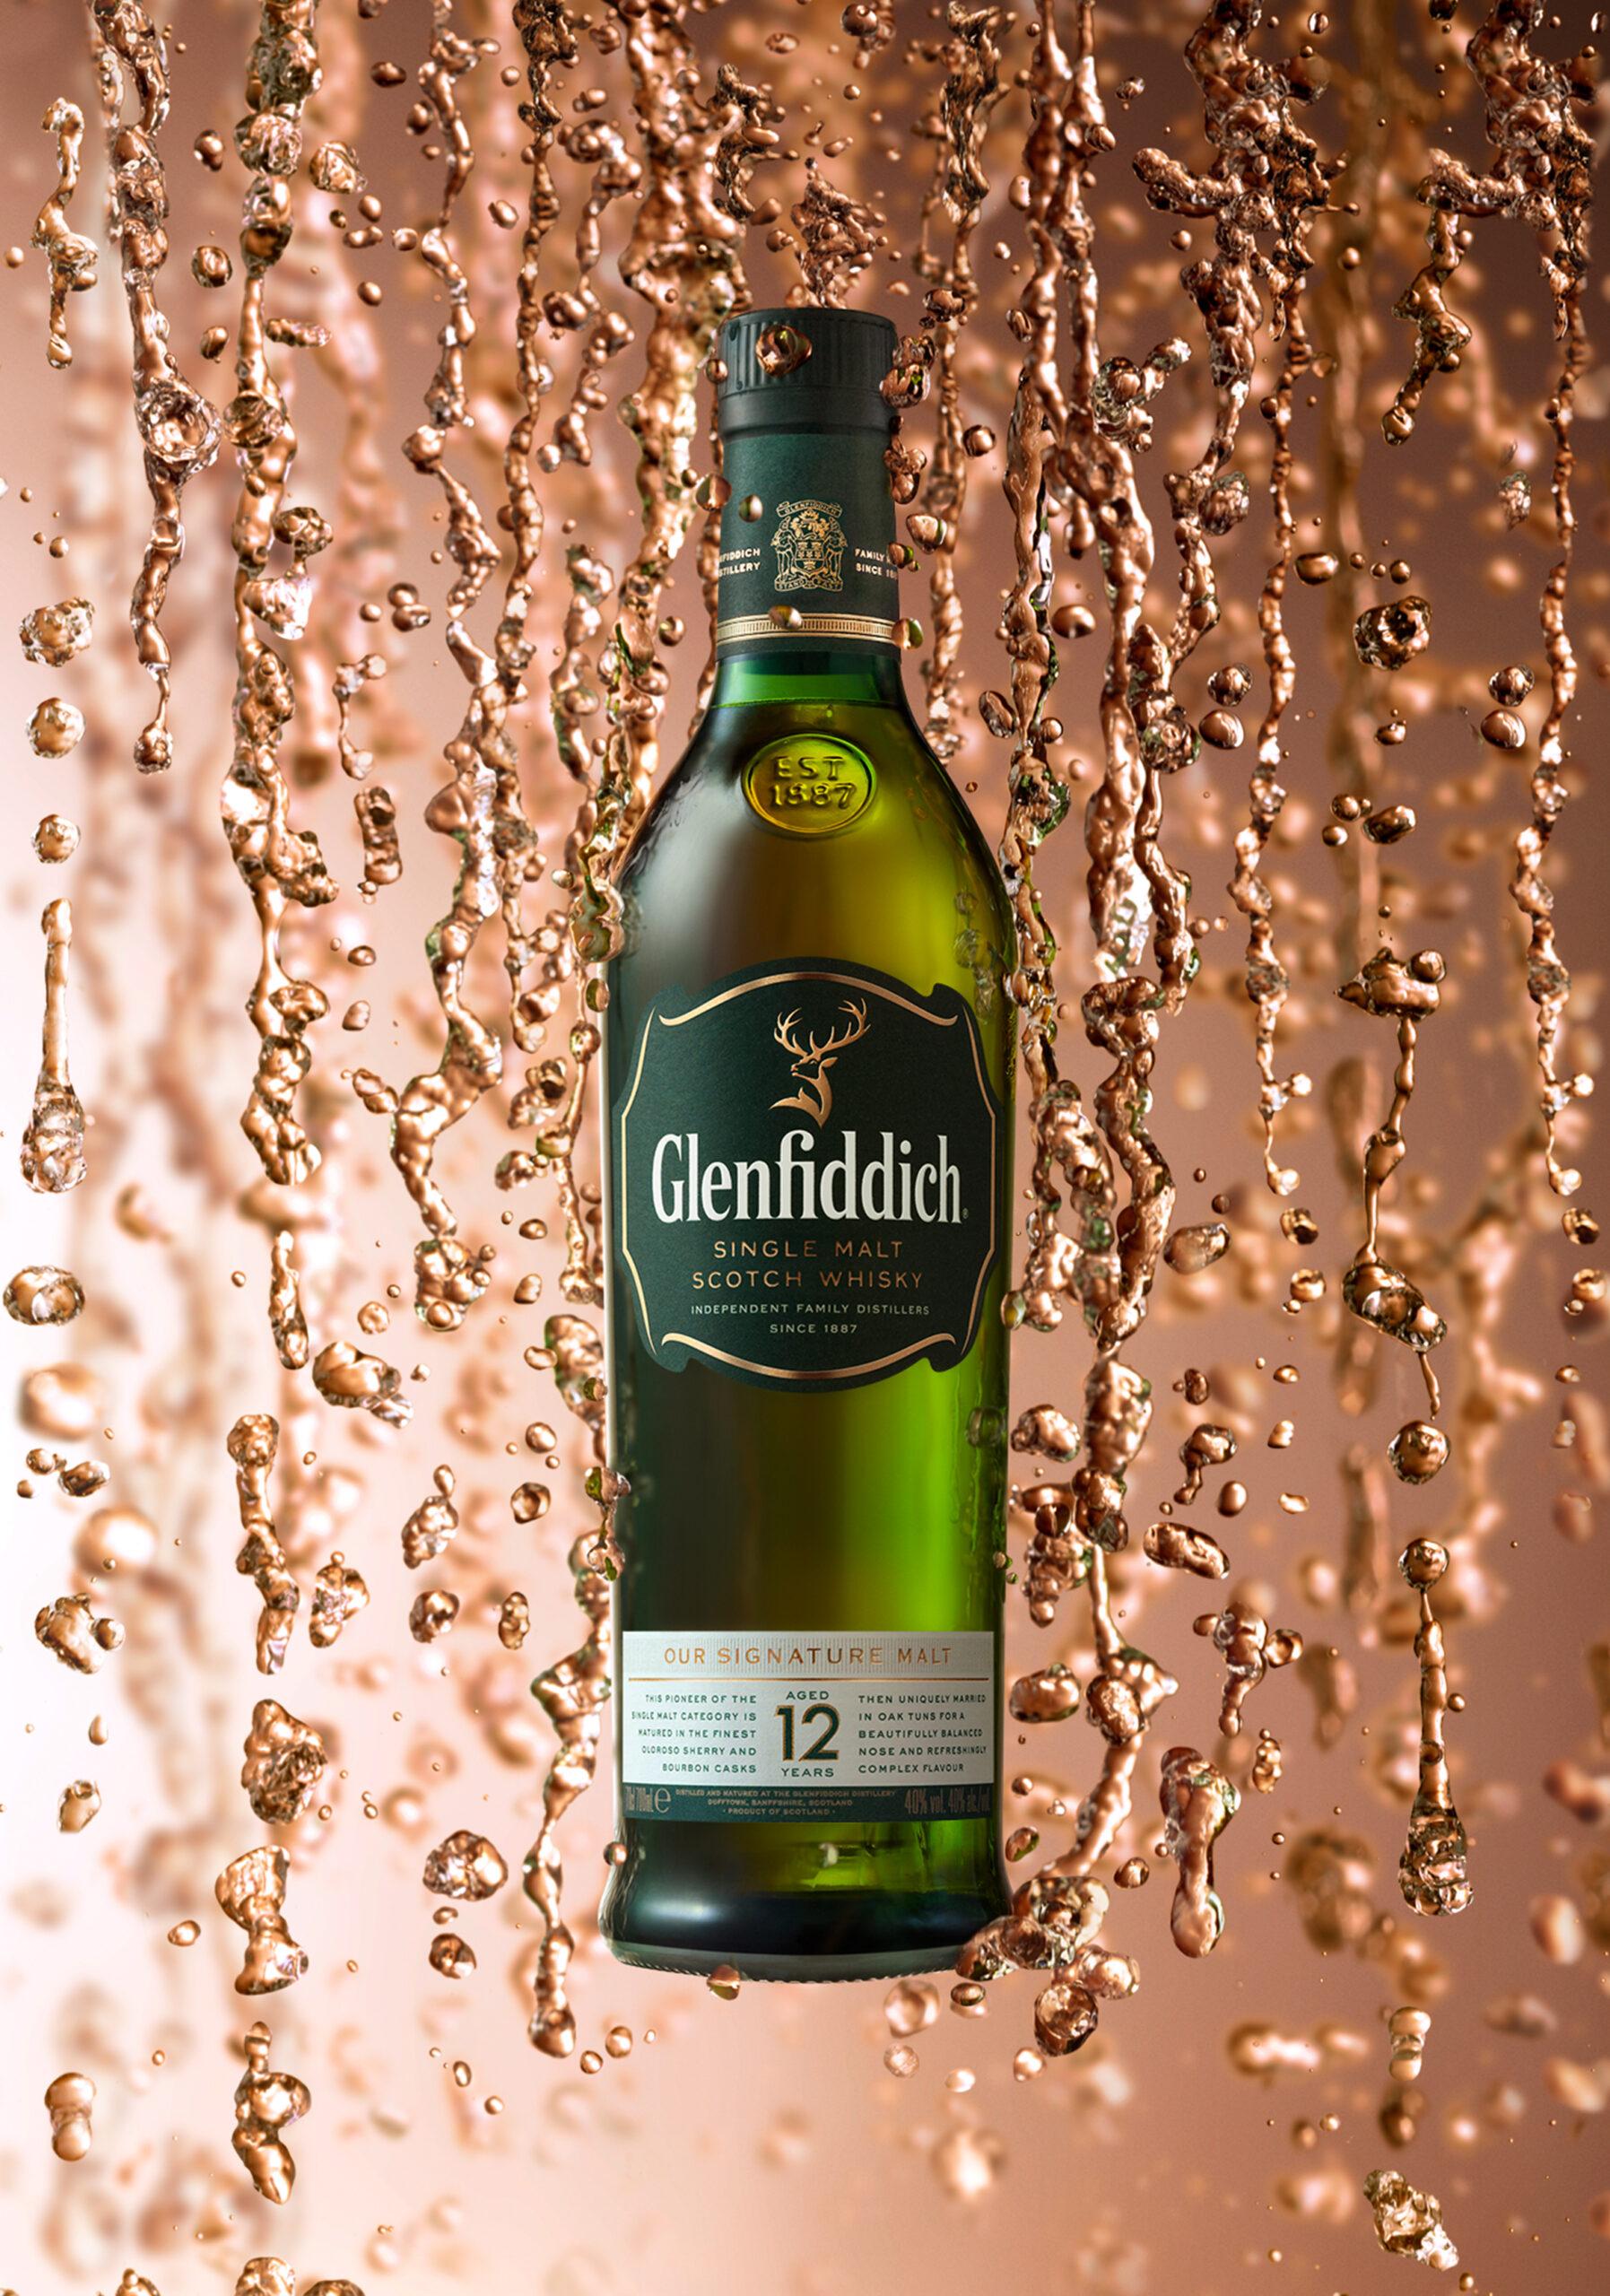 2340x1440_Glenfiddich12_v2